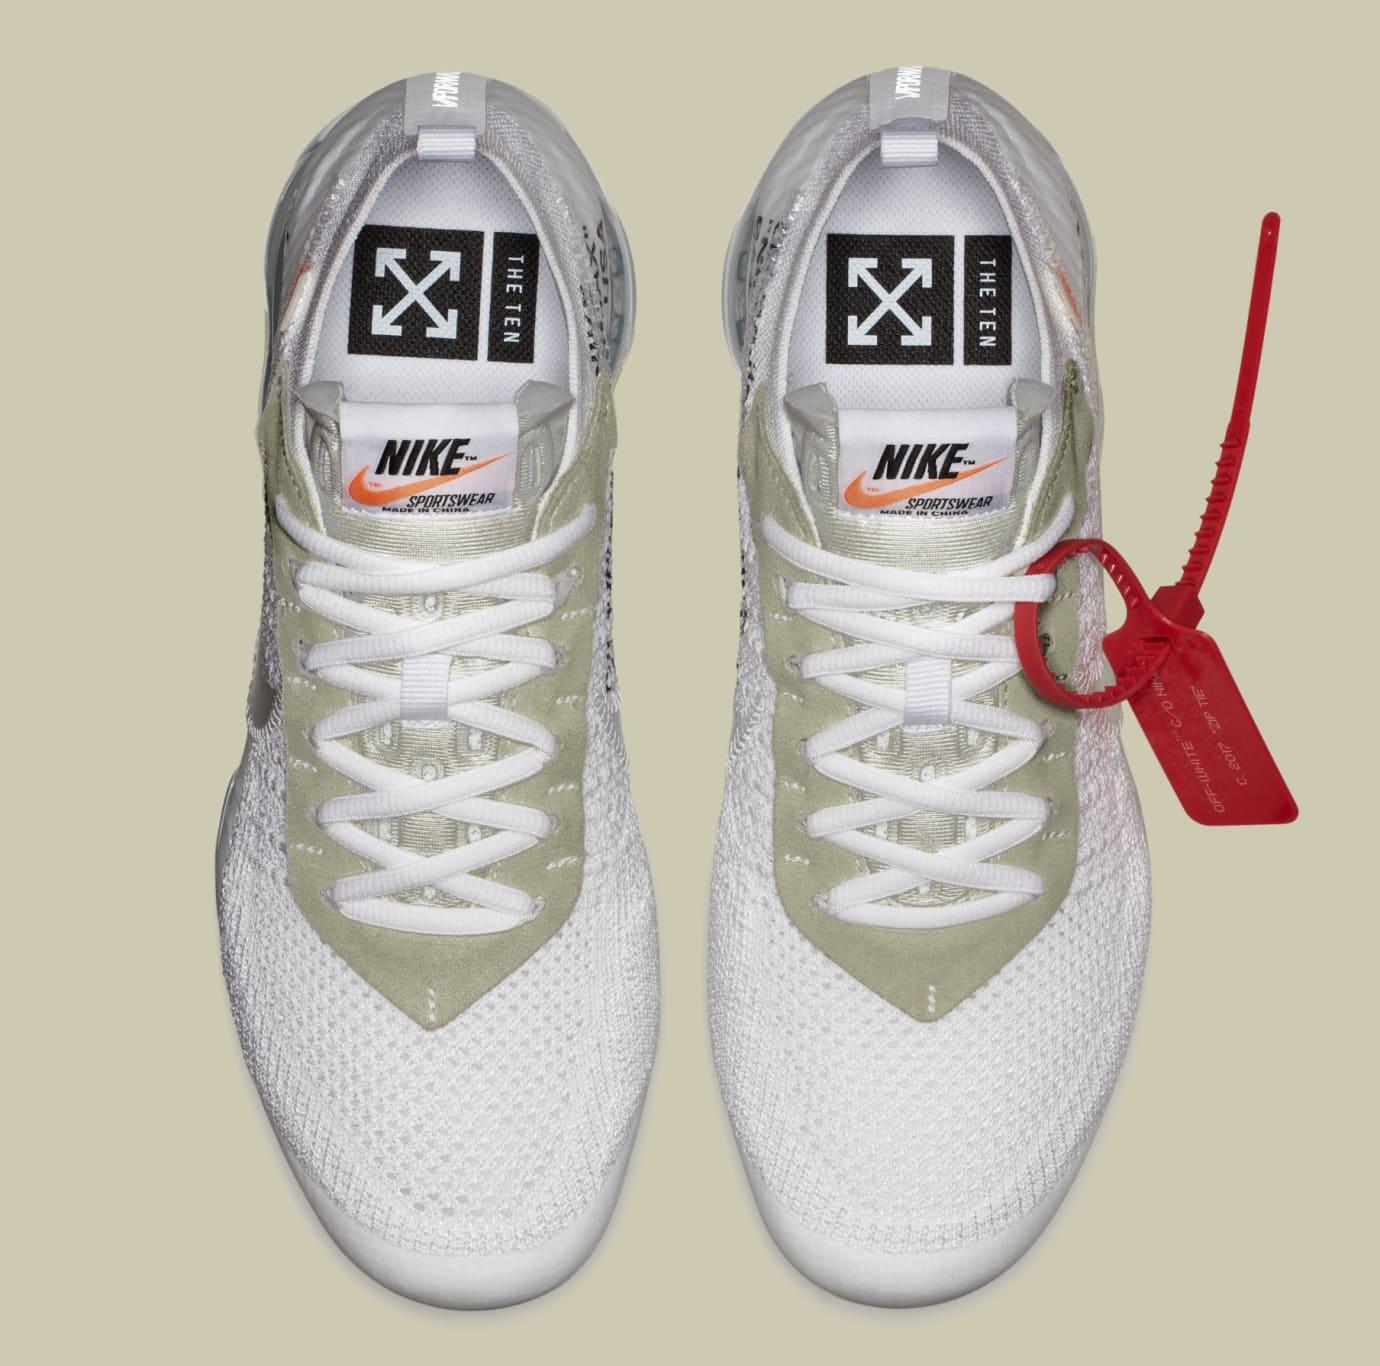 Off-White x Nike Air VaporMax 'White/Black/Total Orange' AA3831-100 (Top)